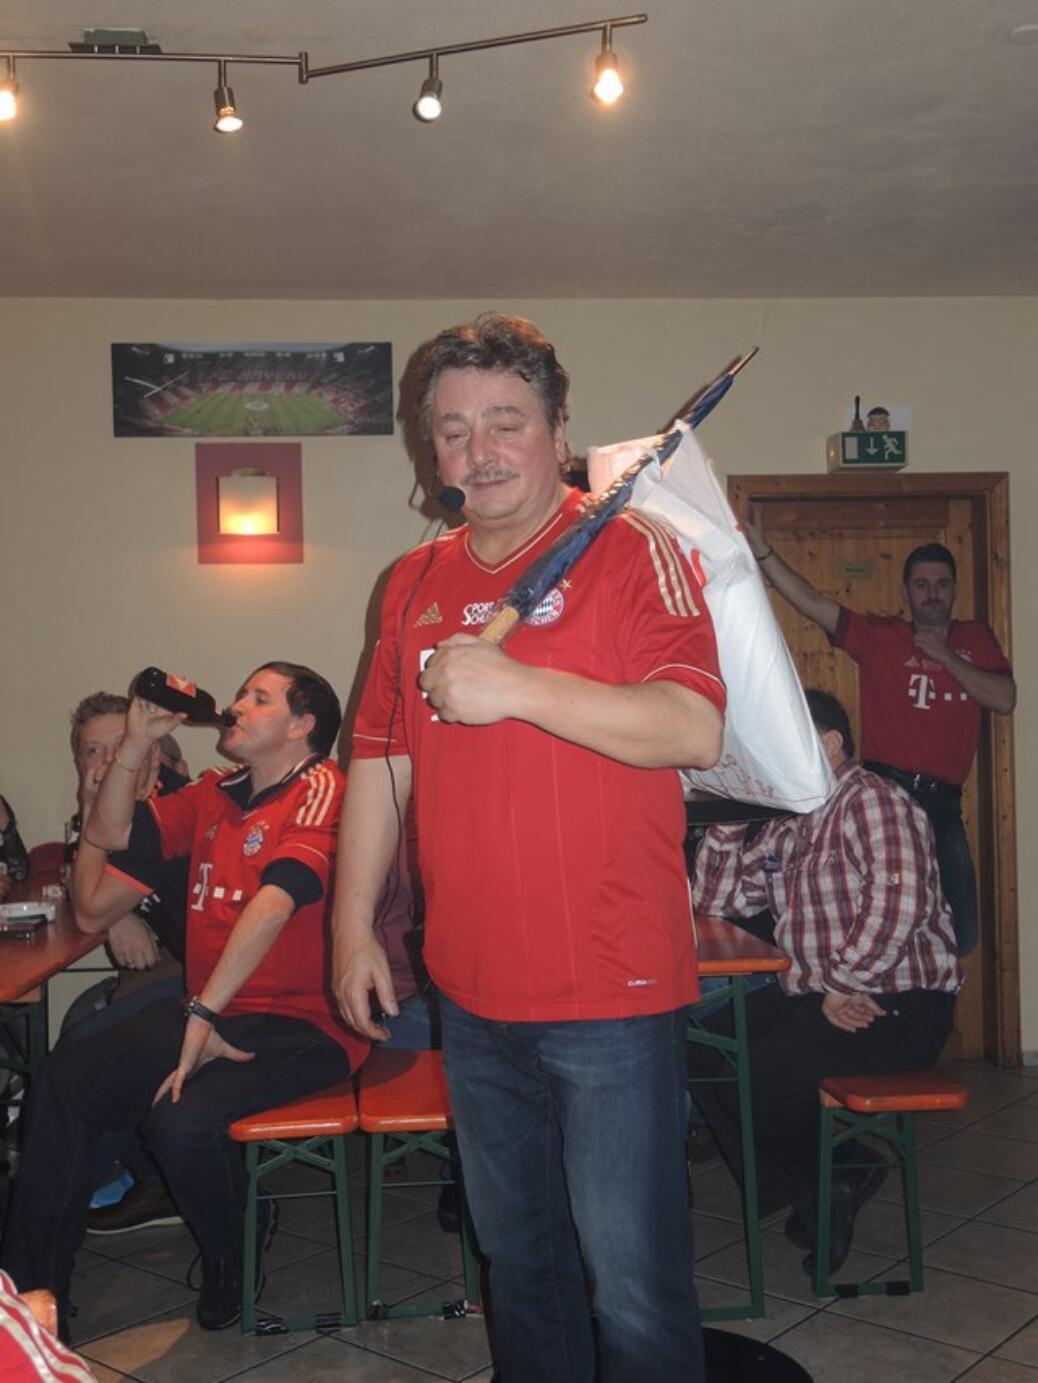 Christbaumversteigerung beim Fanclub Seehaus